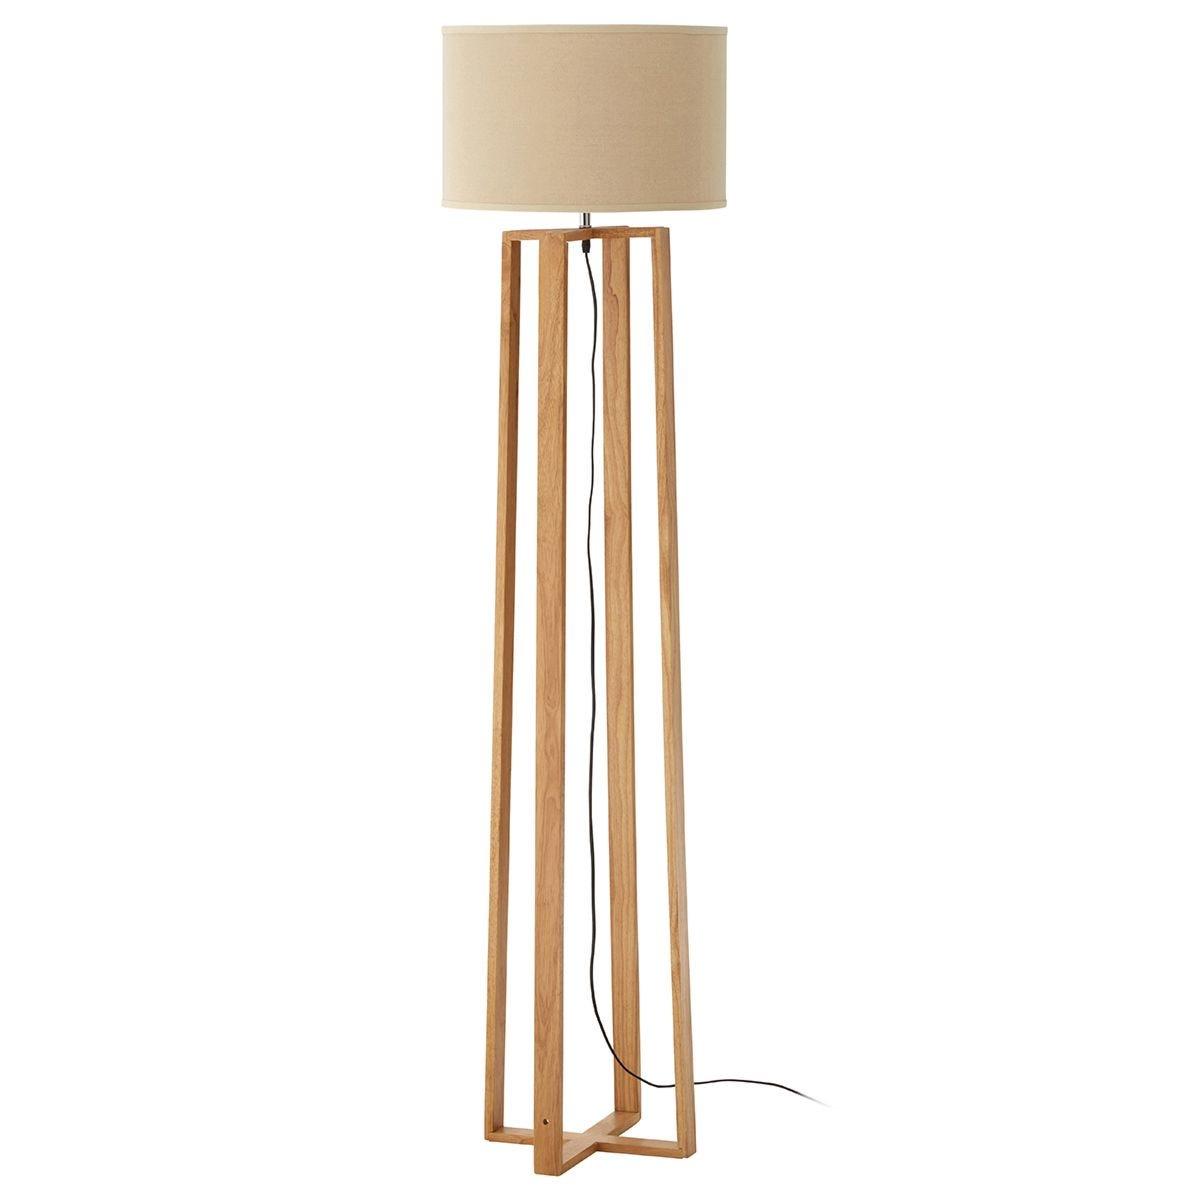 Premier Housewares Lea Wooden Floor Lamp with Brown Fabric Shade